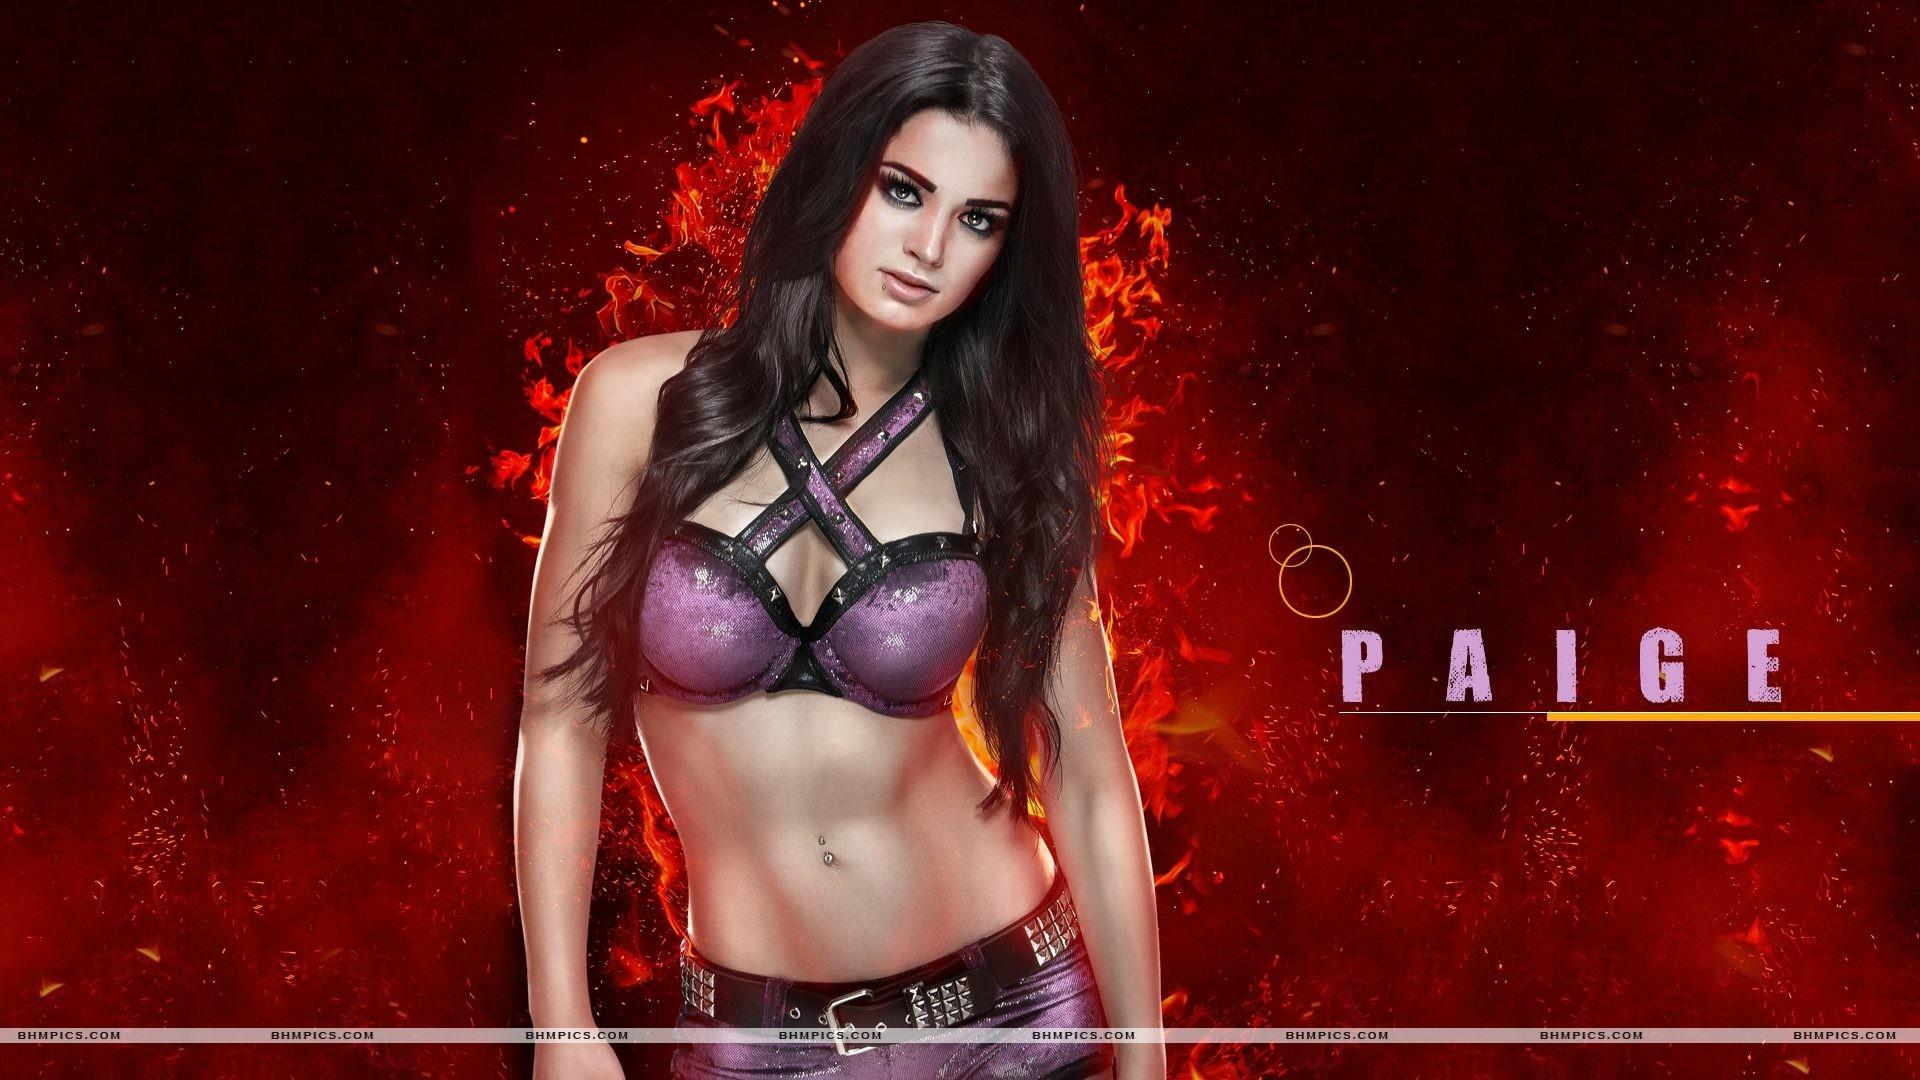 Paige Wrestler wallpaper for desktop